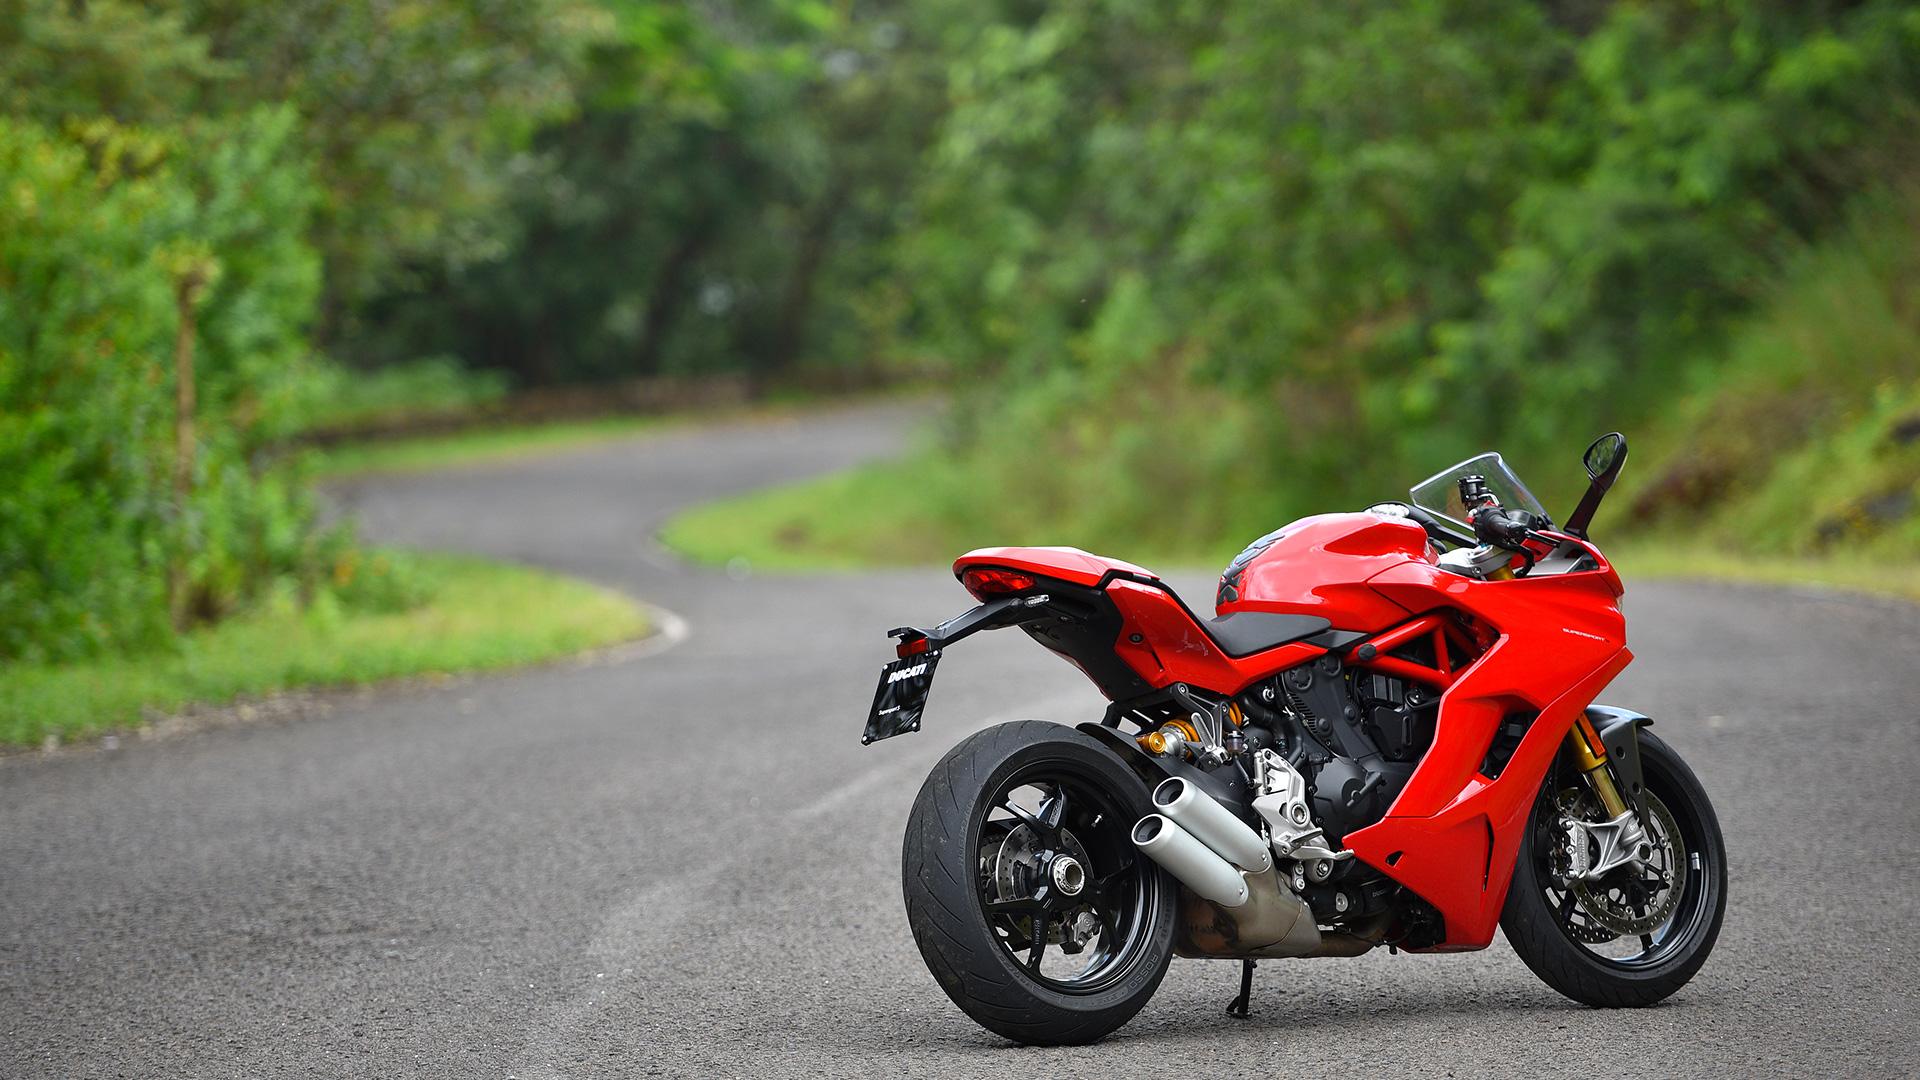 Ducati 939 Supersport 2017 S